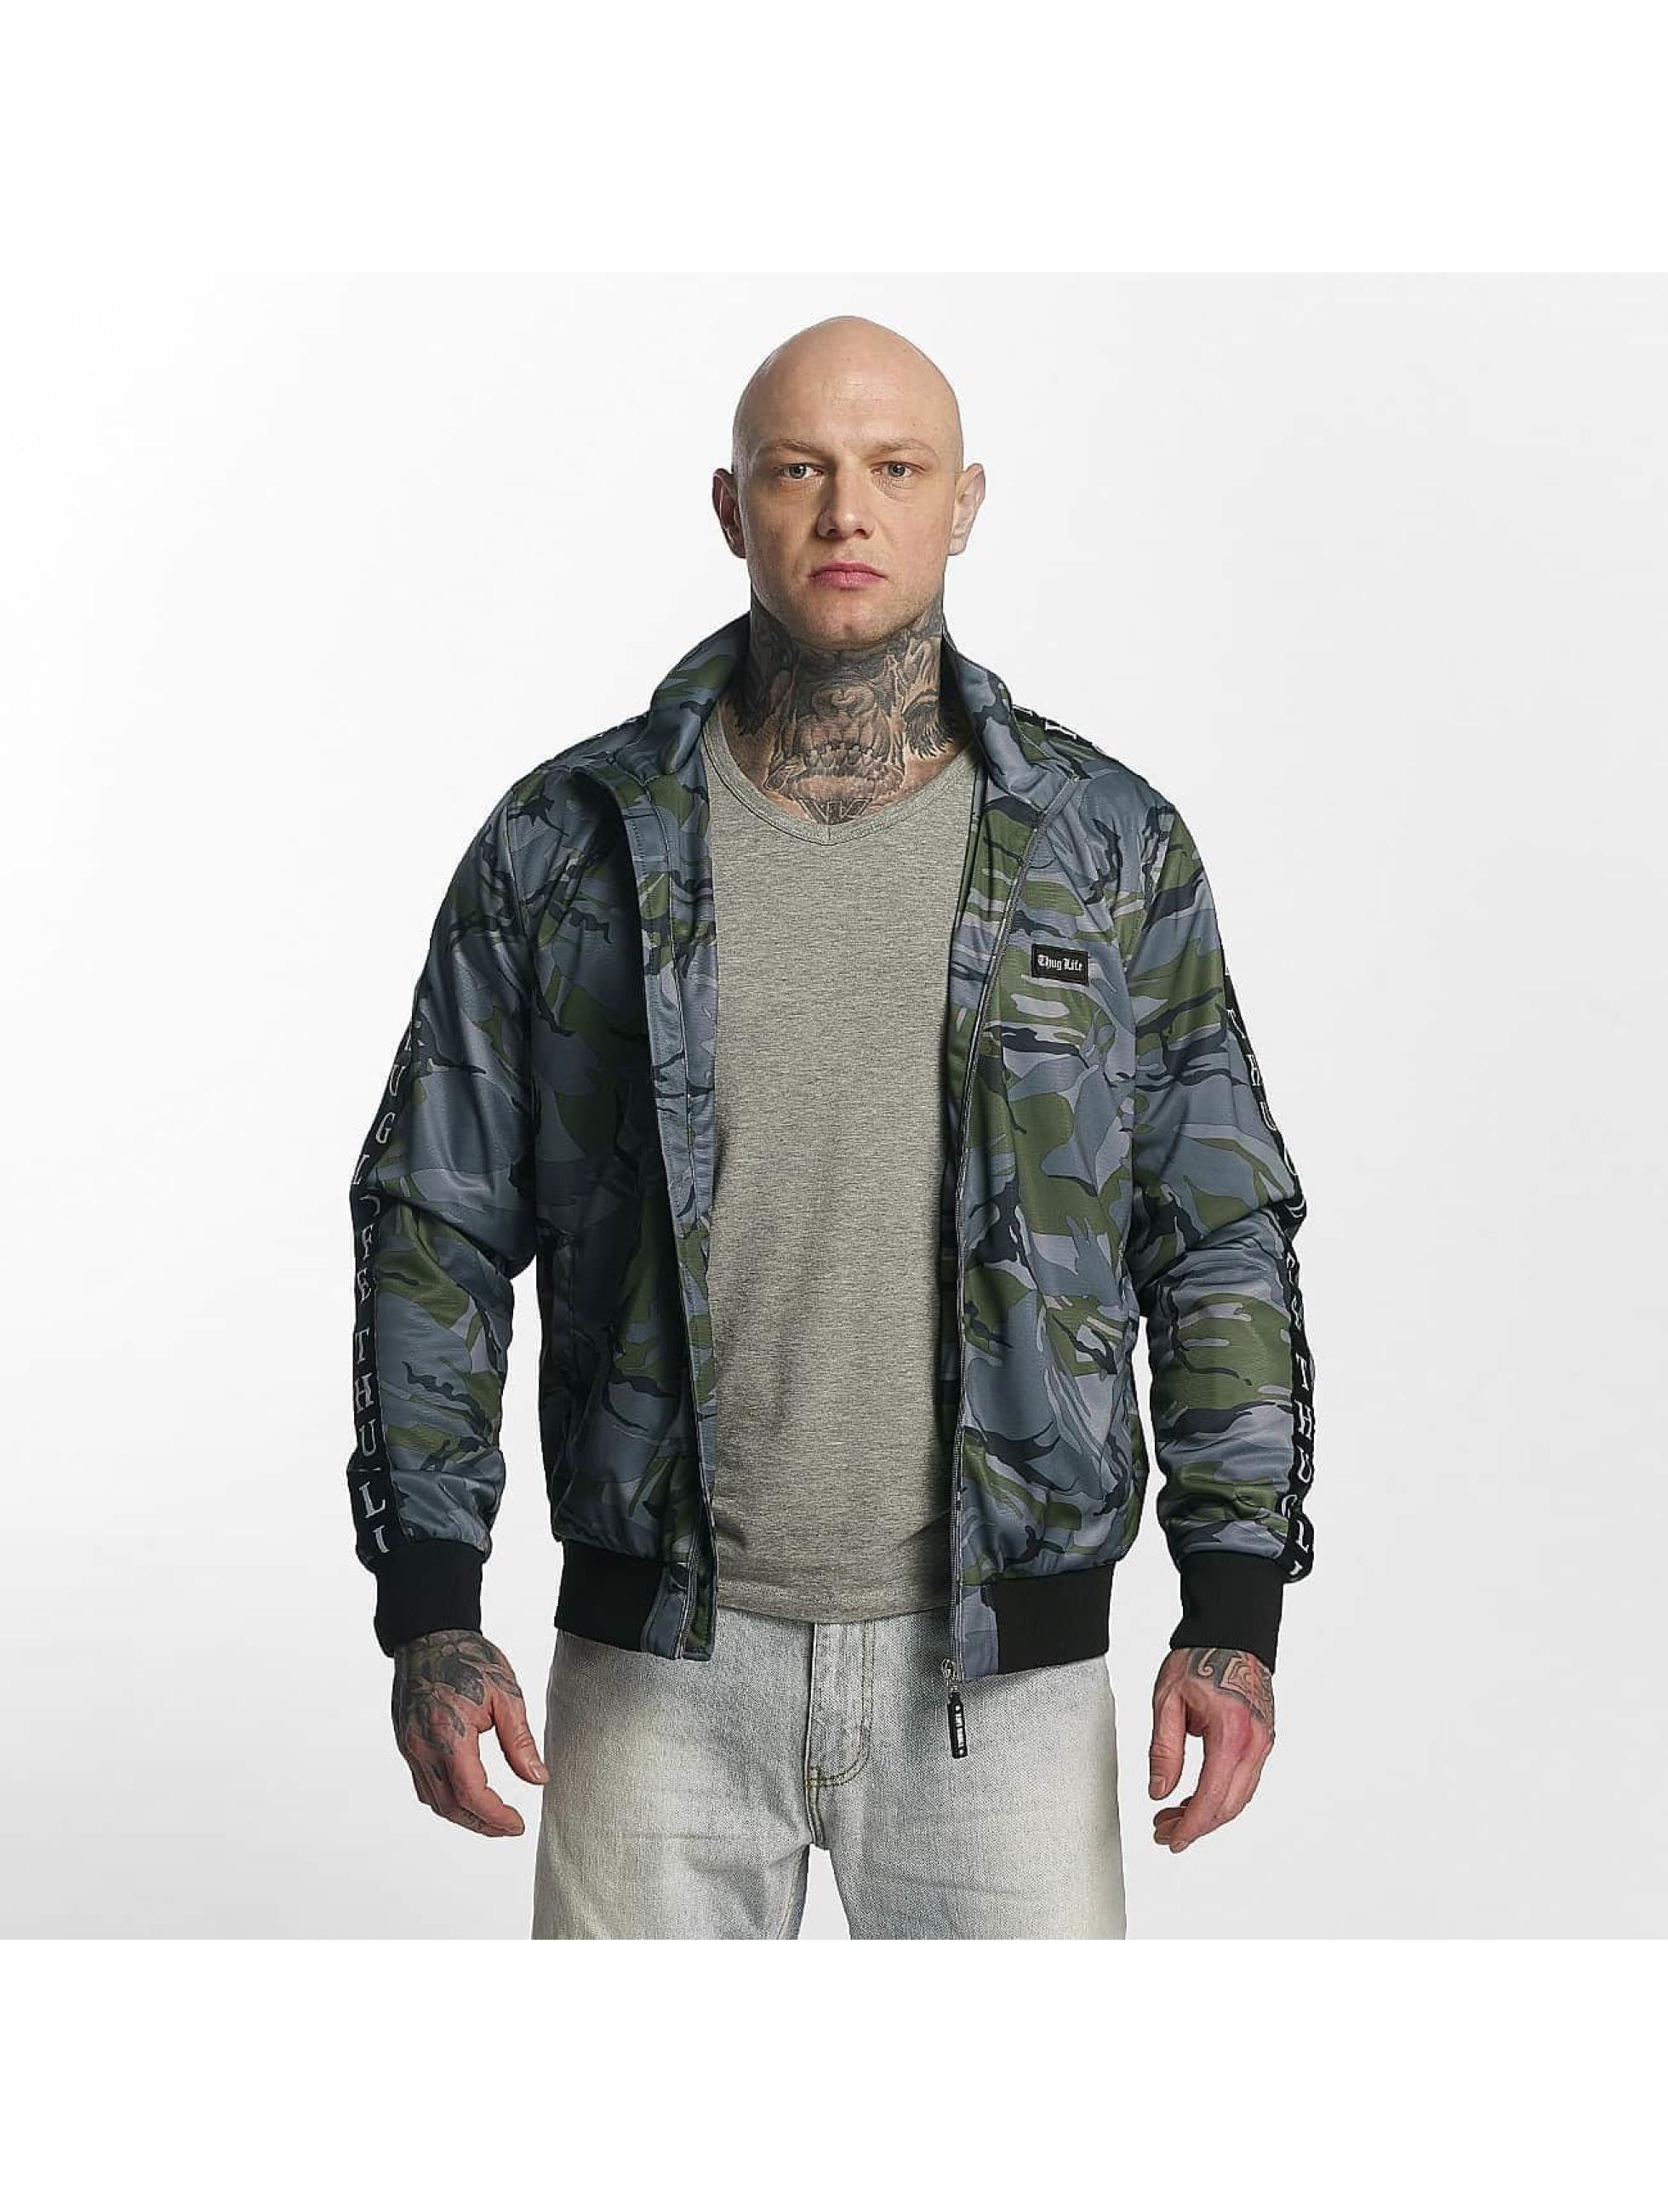 Thug Life / Lightweight Jacket Wired in grey XL